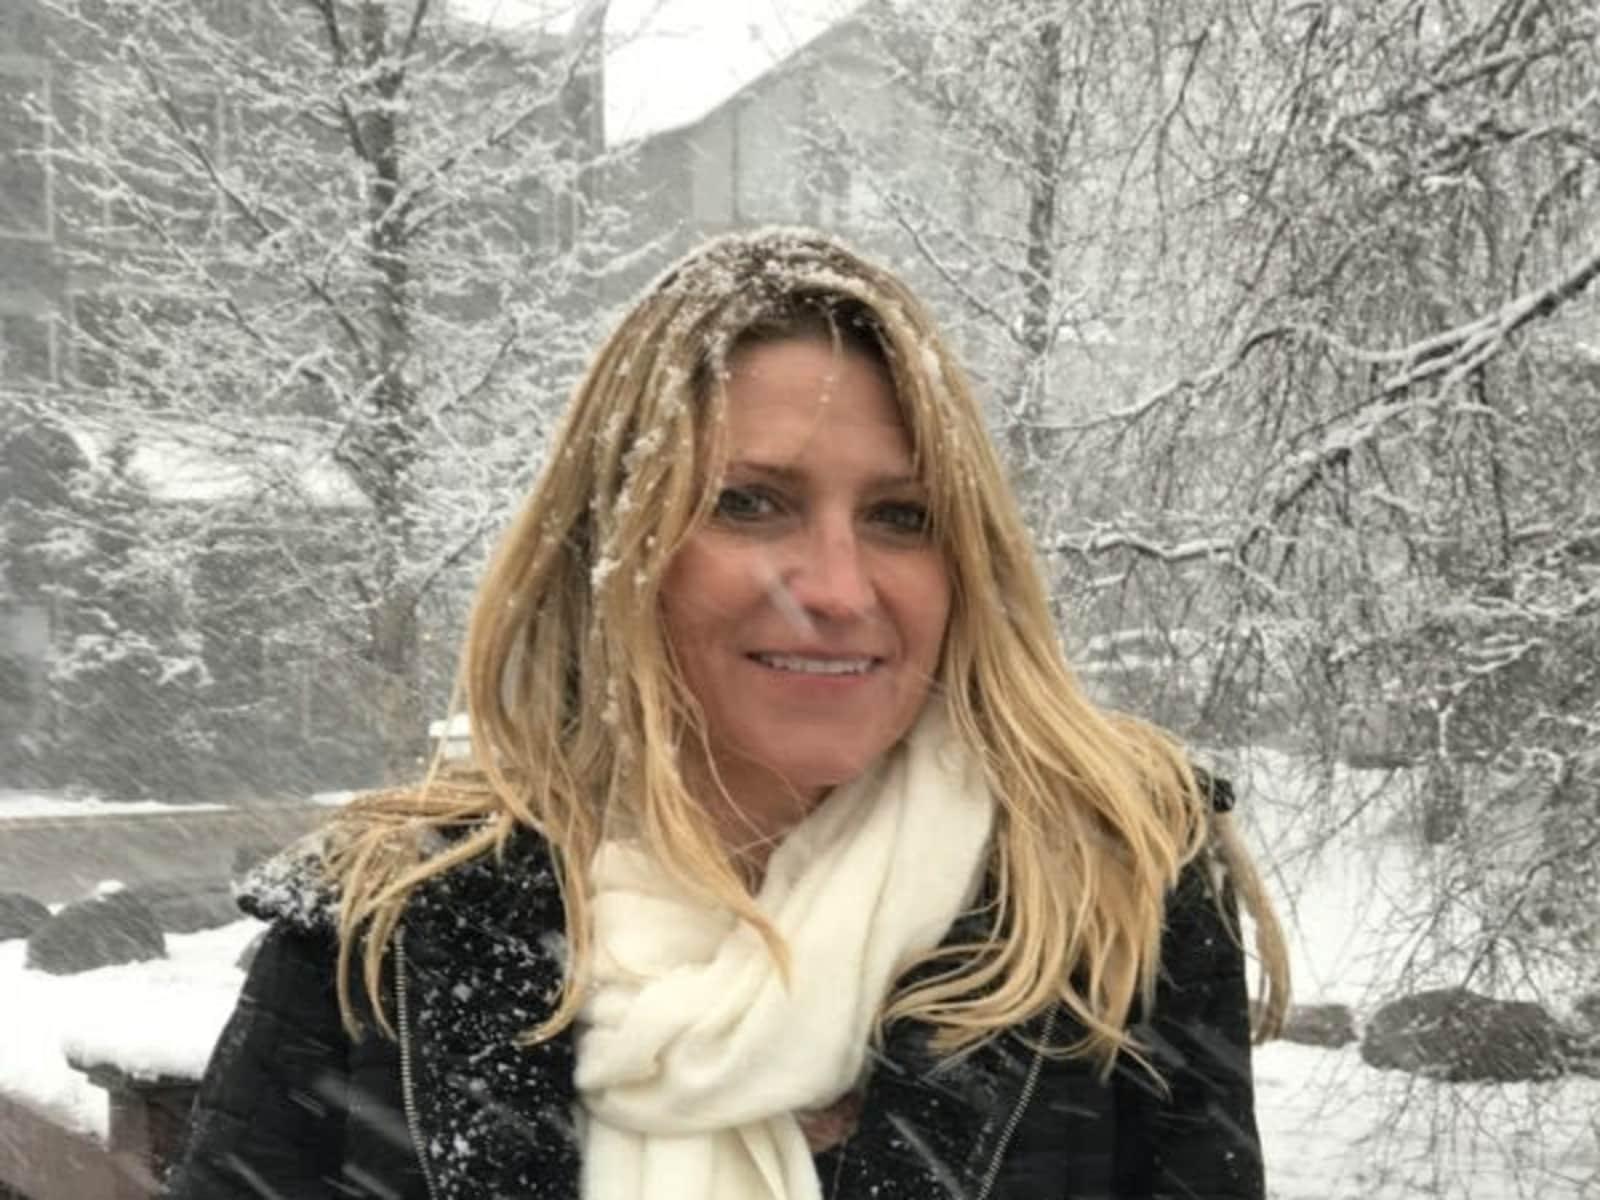 Elle from Durango, Colorado, United States